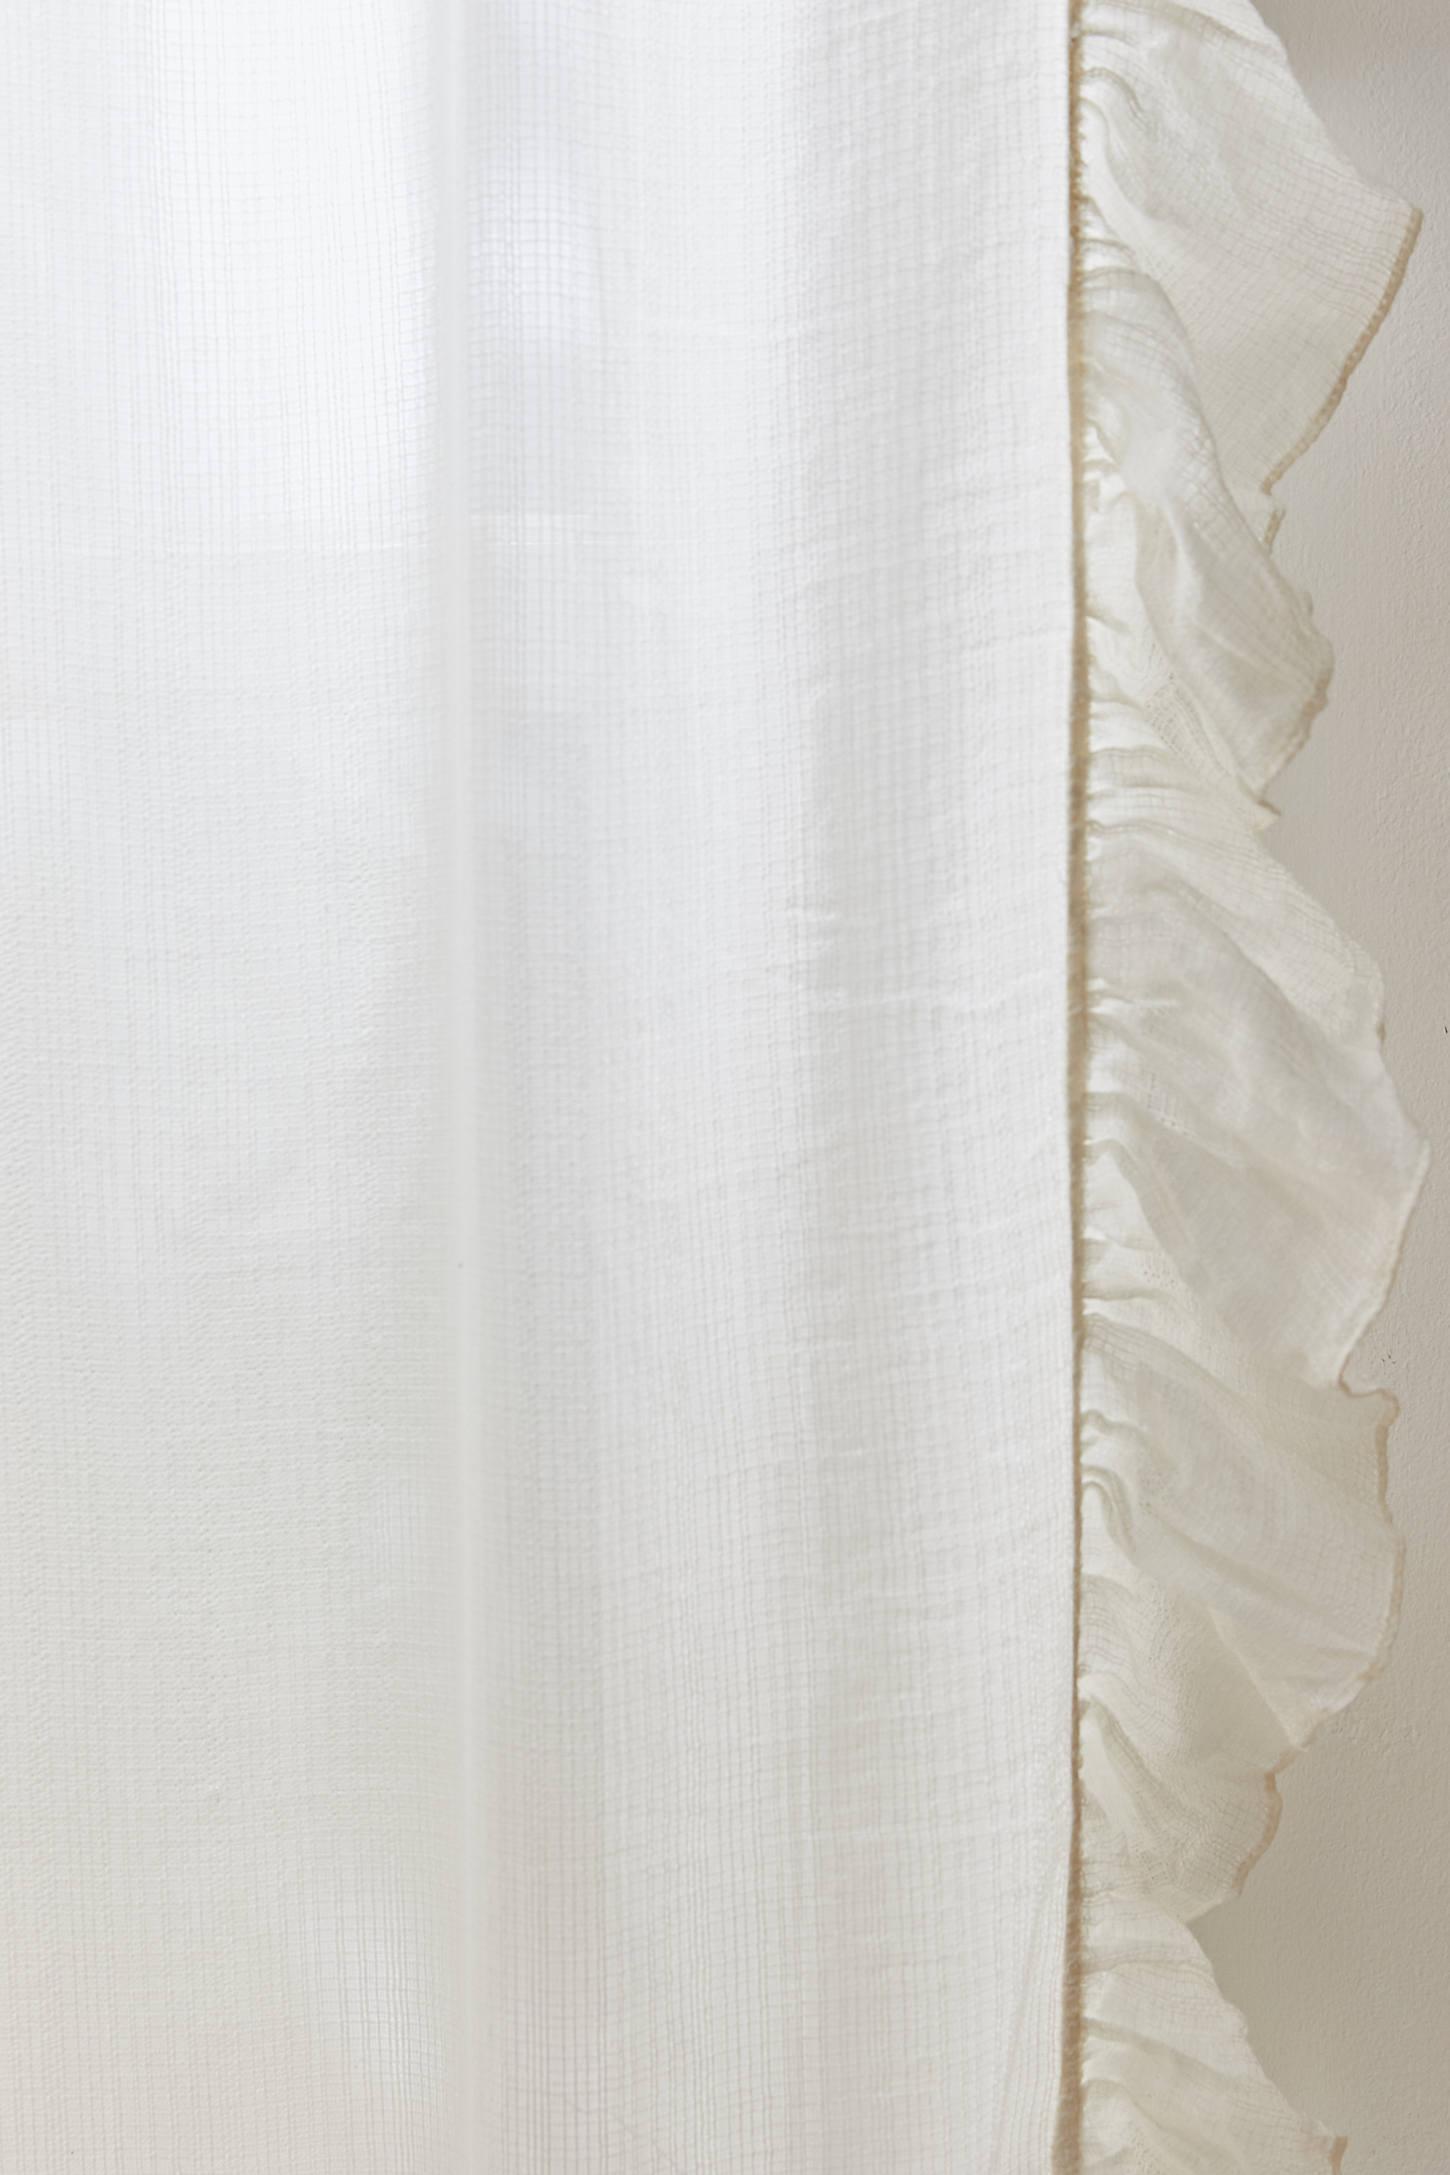 White ruffle curtain - Slide View 3 Ruffle Gauze Curtain